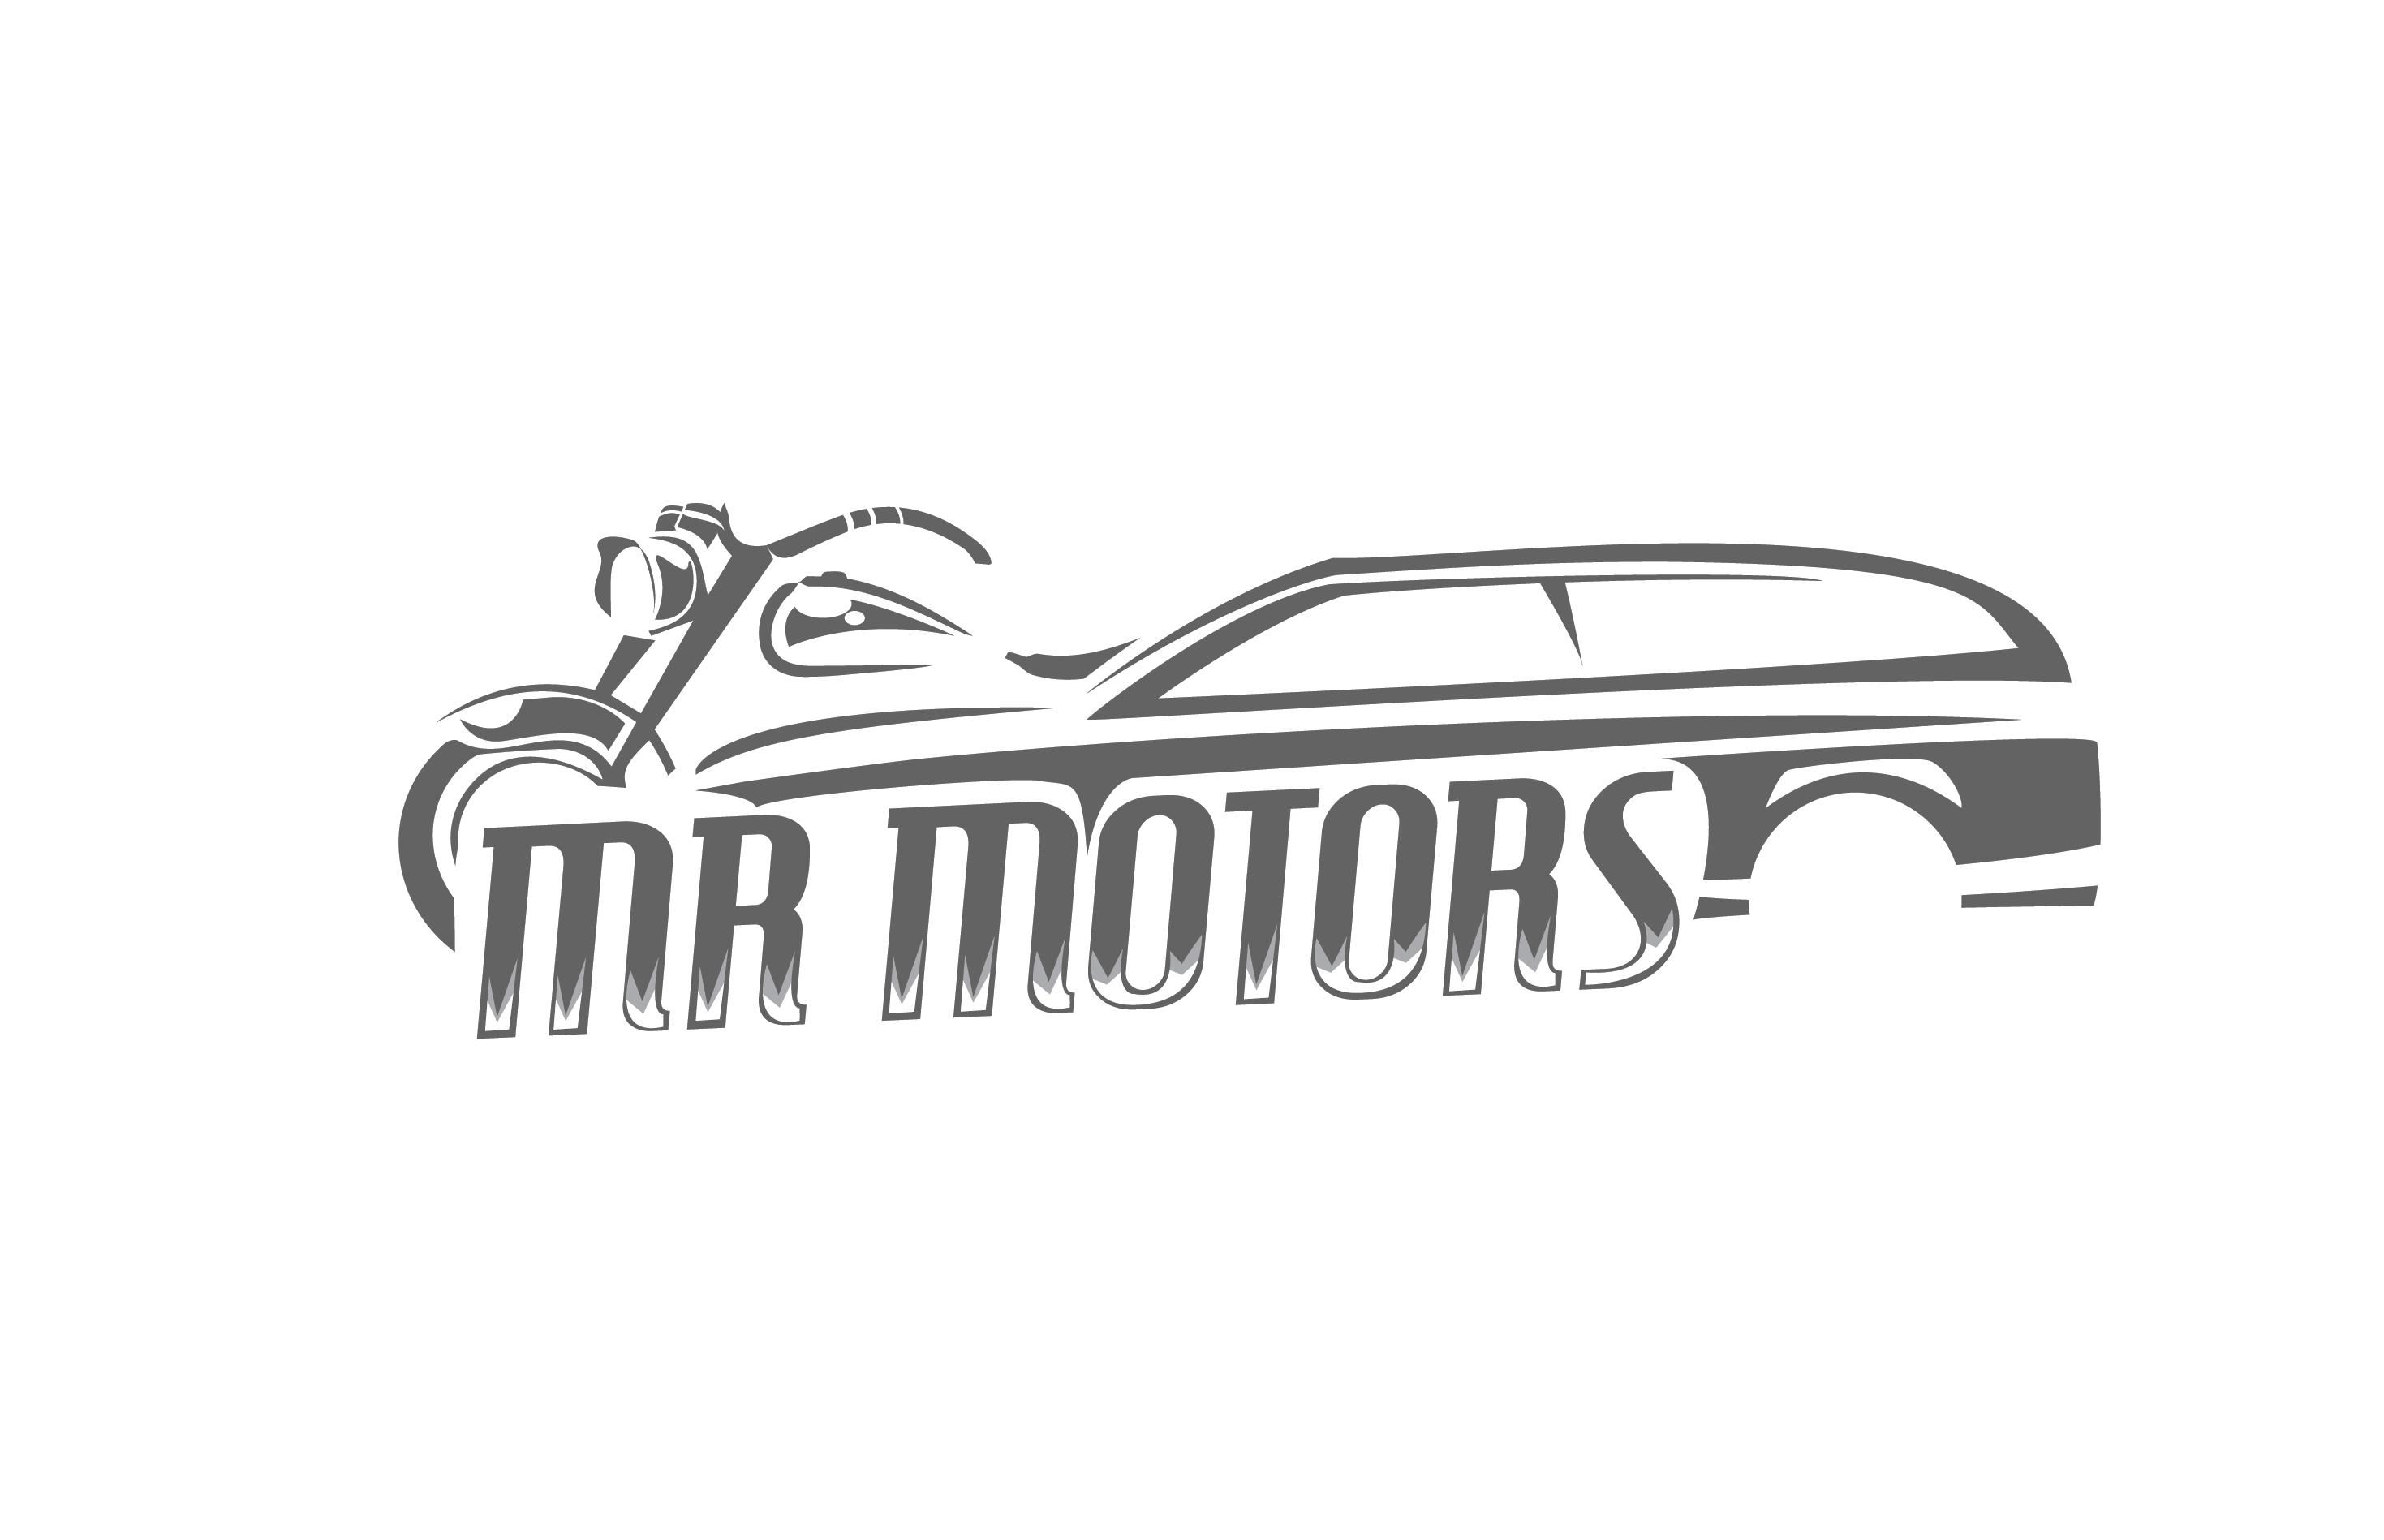 Logo Design by Dawud Majid - Entry No. 56 in the Logo Design Contest Creative Logo Design for MR Motors.